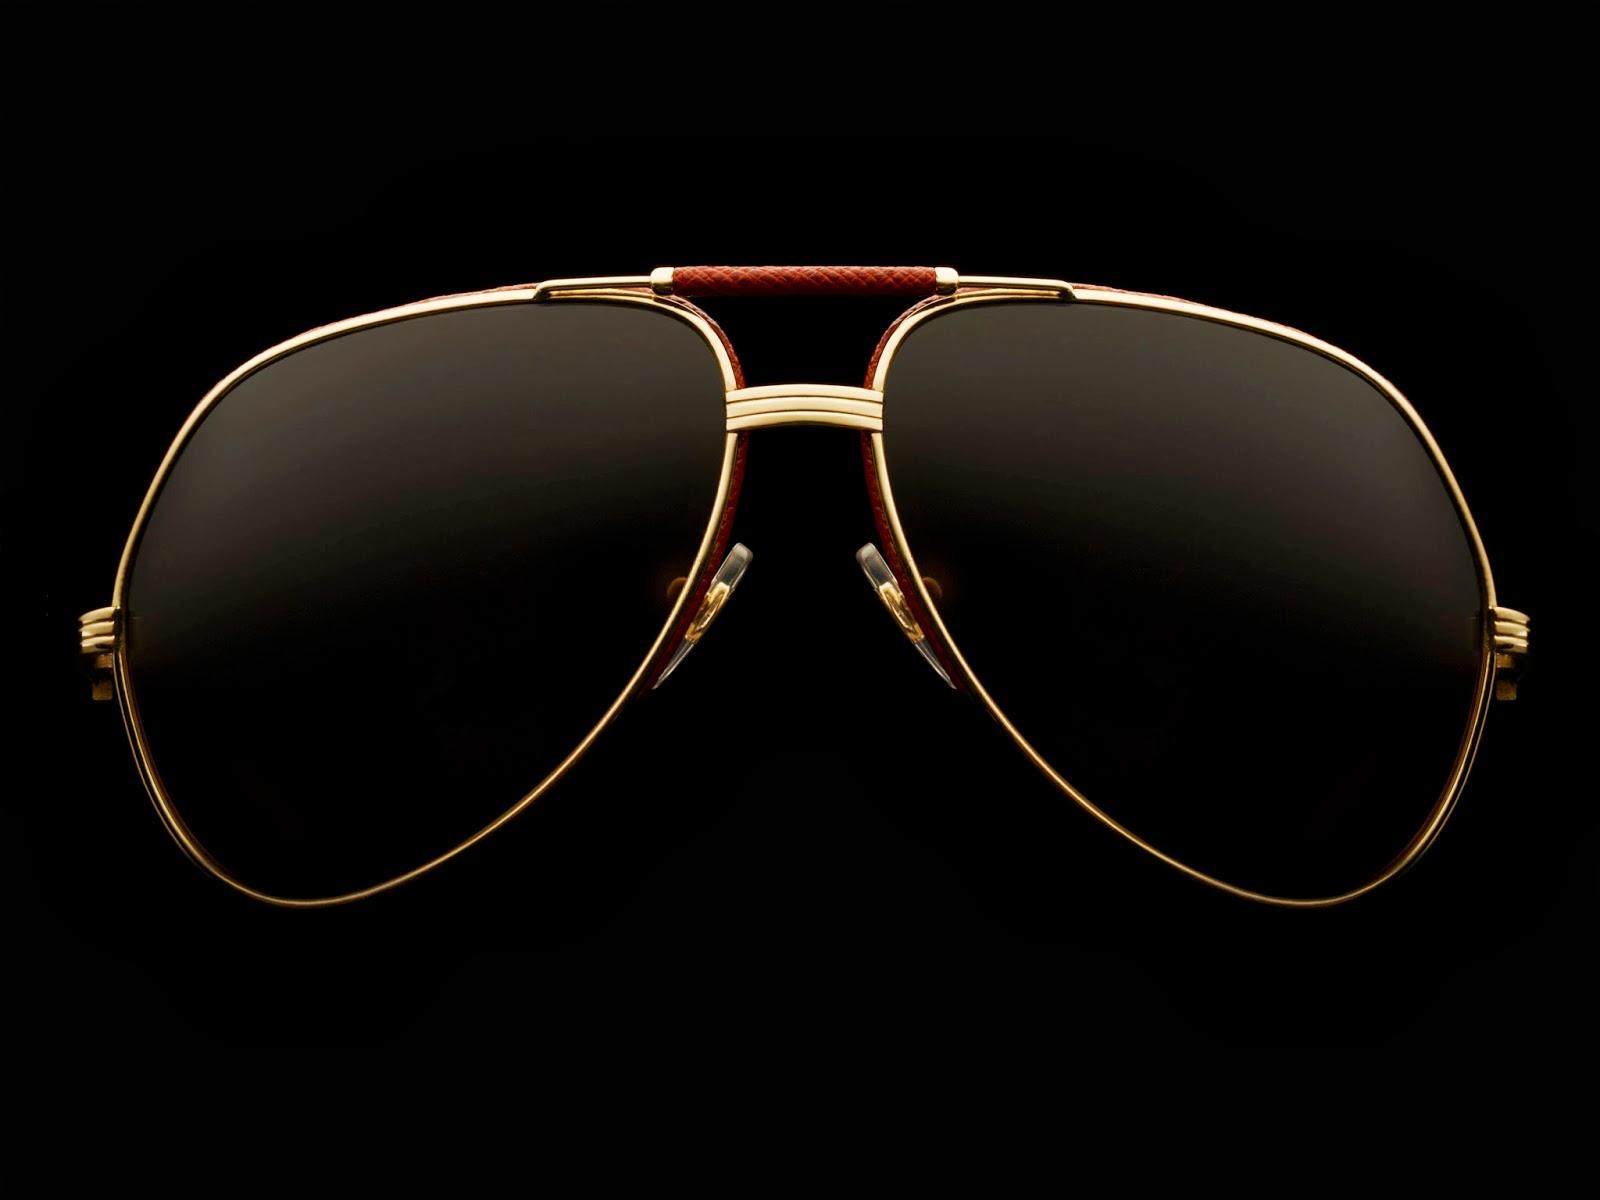 579b93ce296d45 Cartier Aviator Sunglasses Gold